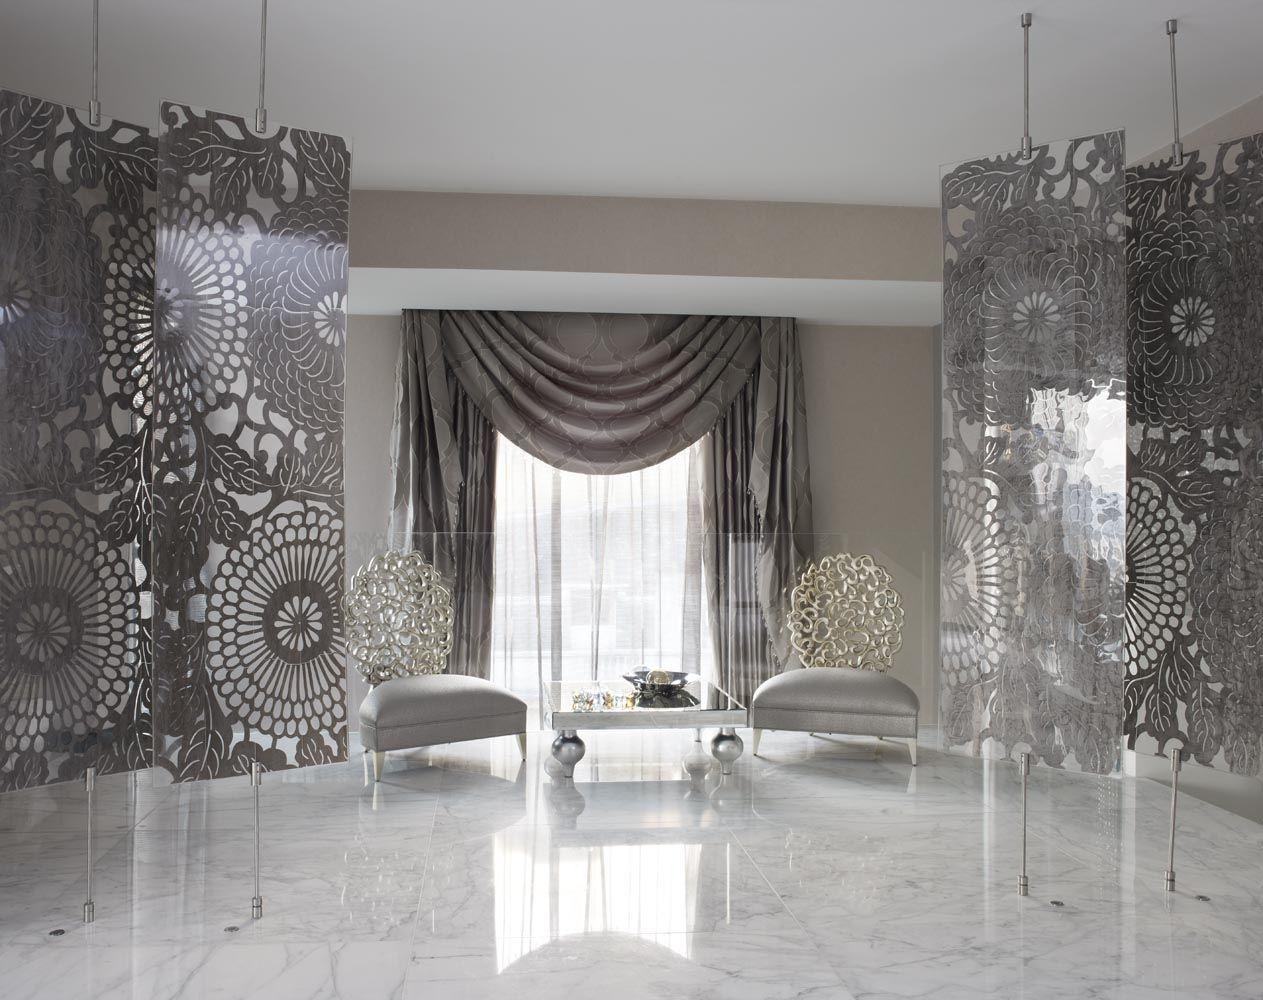 Walpole Mayfair By Oliver Burns Luxury Home Decor